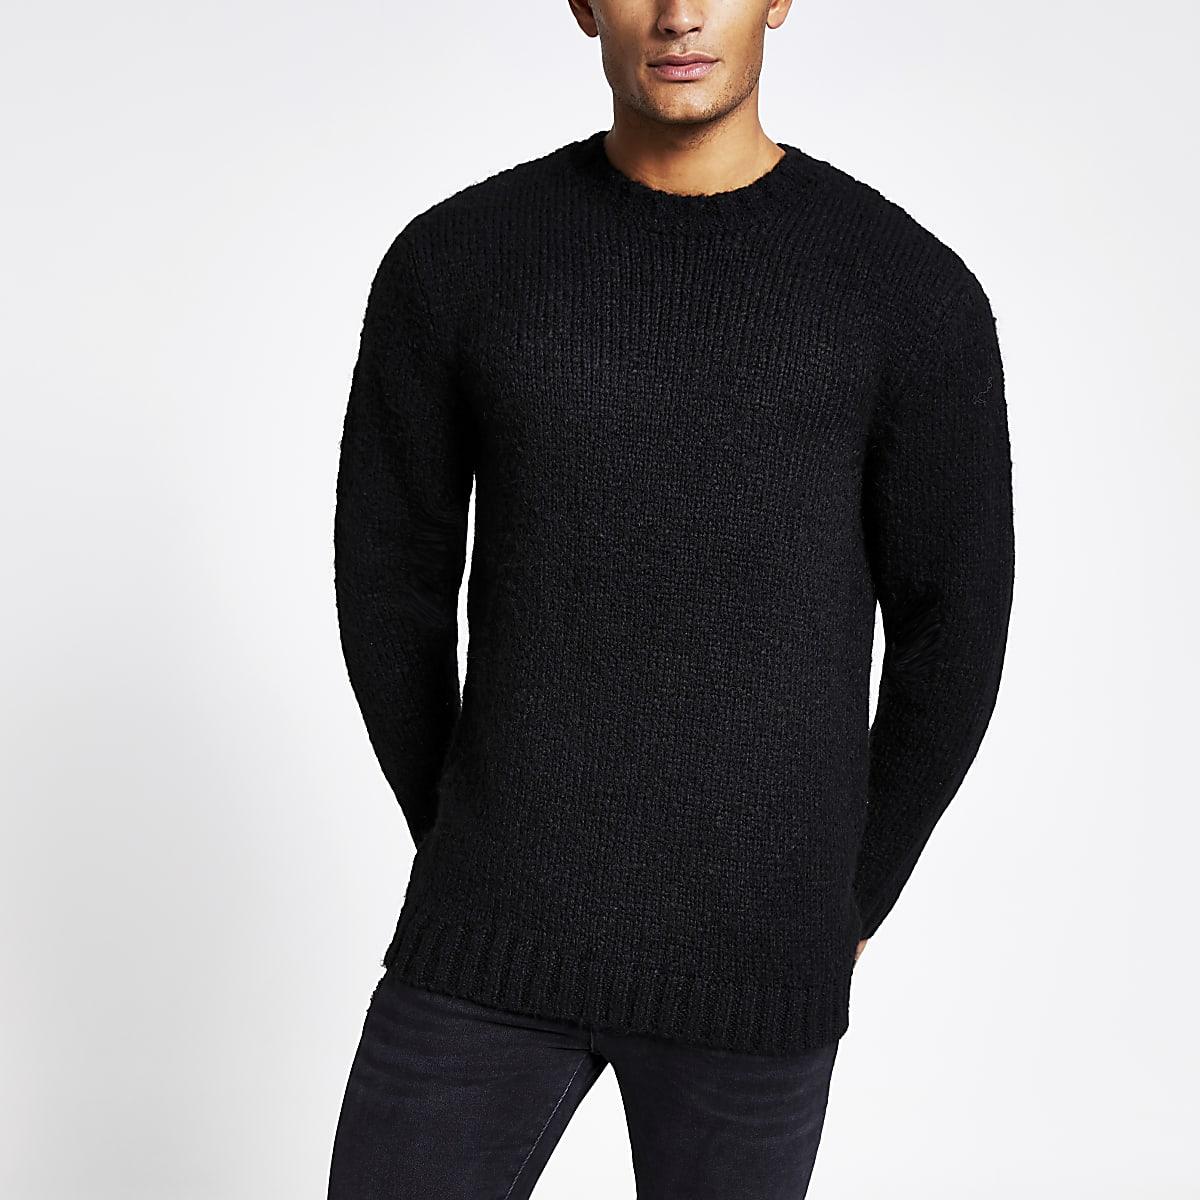 Black long sleeve regular fit knitted jumper